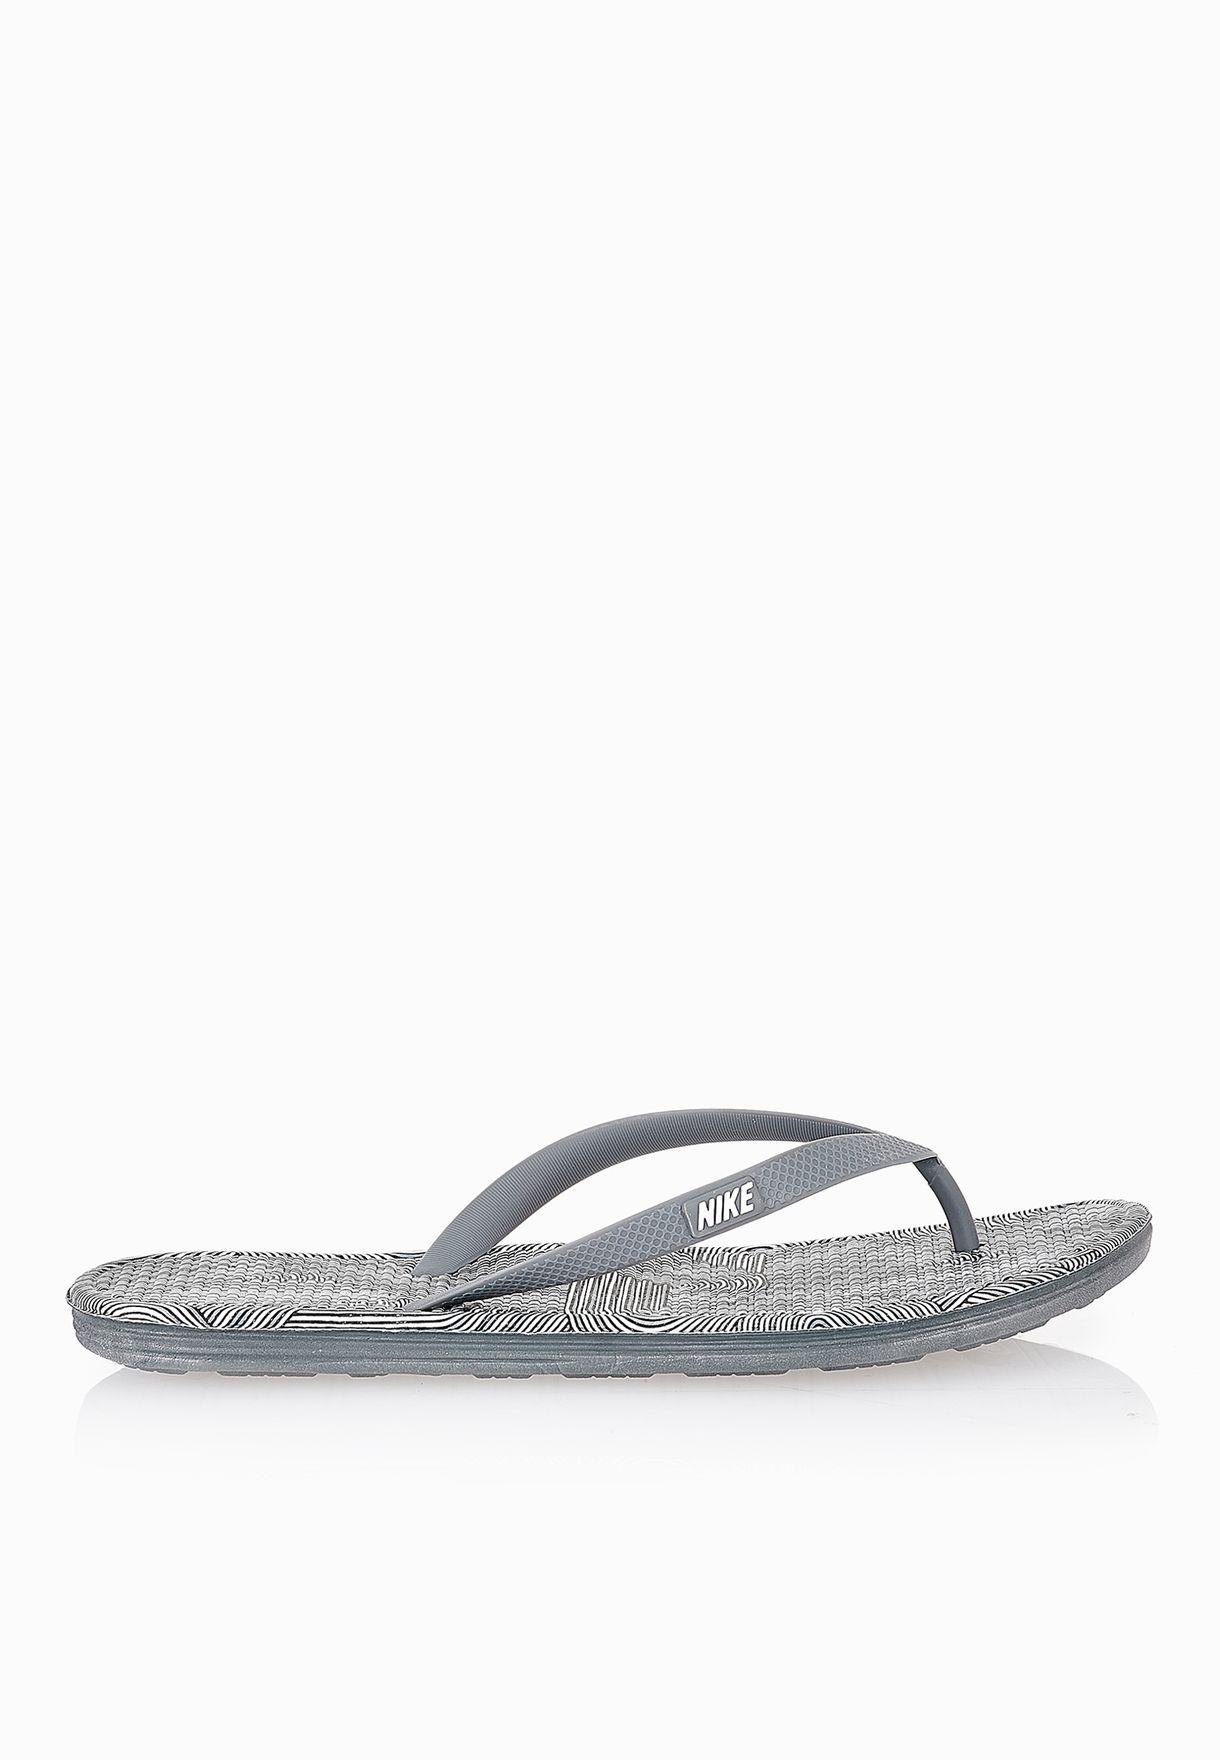 a6b1baf71 Shop Nike grey Solarsoft Thong 2 Print 511365-017 for Men in Saudi -  NI727SH29GIW